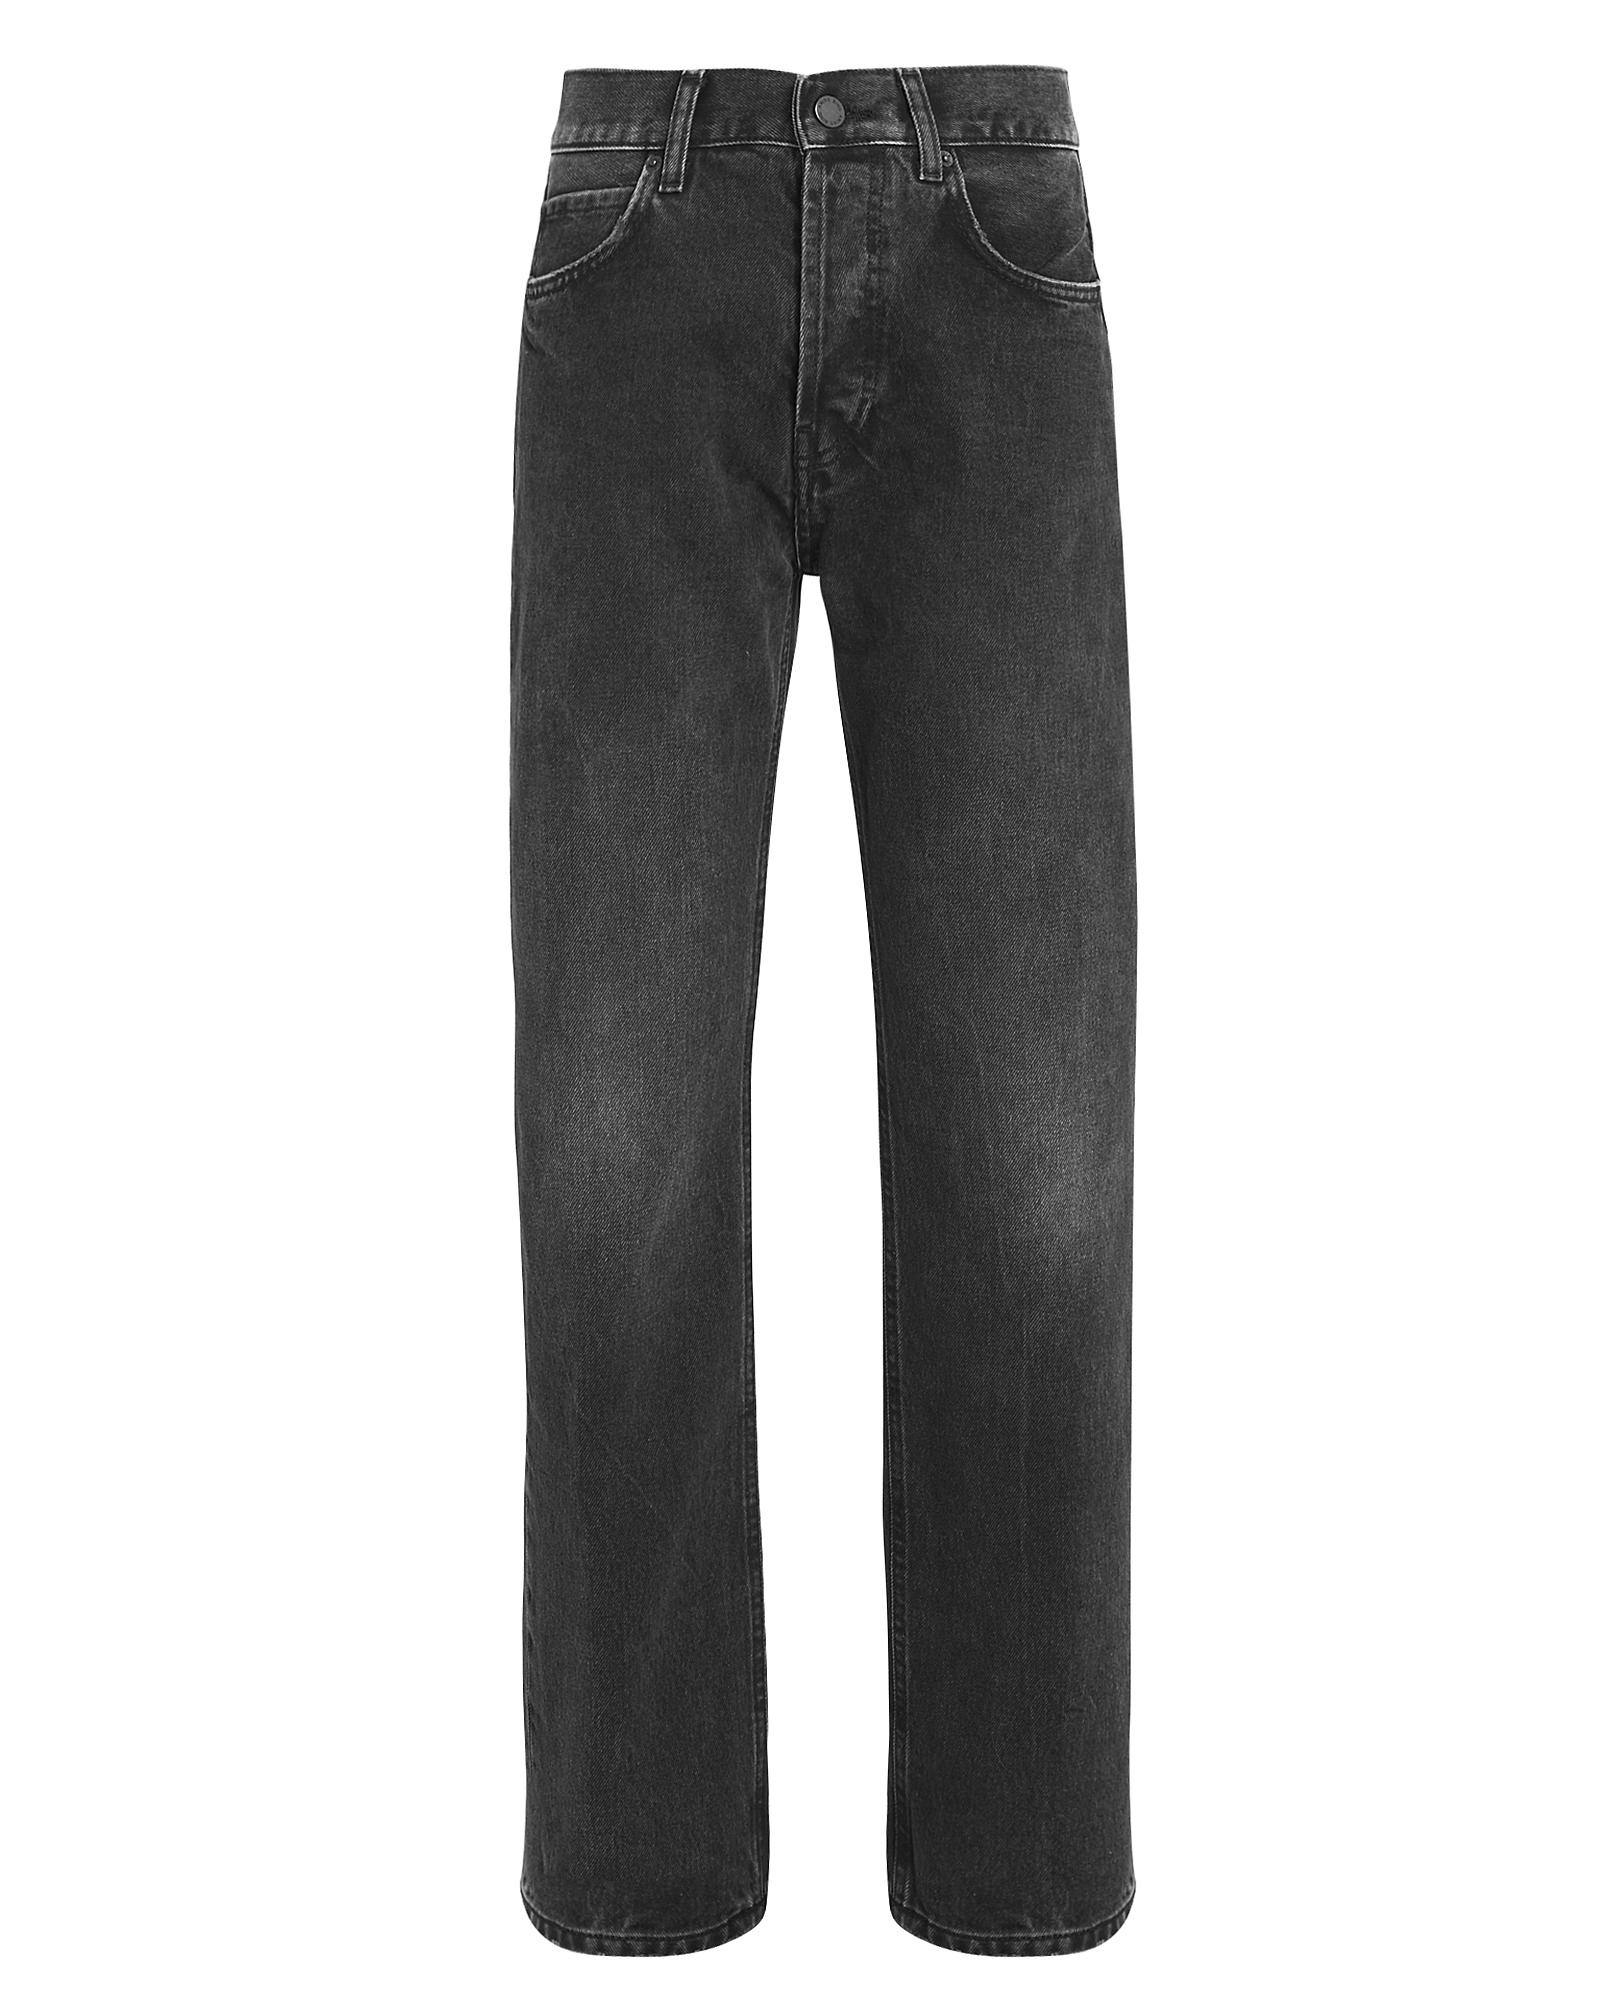 Anine Bing Jeans ANINE BING JACKIE STRAIGHT LEG JEANS  VINTAGE BLACK 25